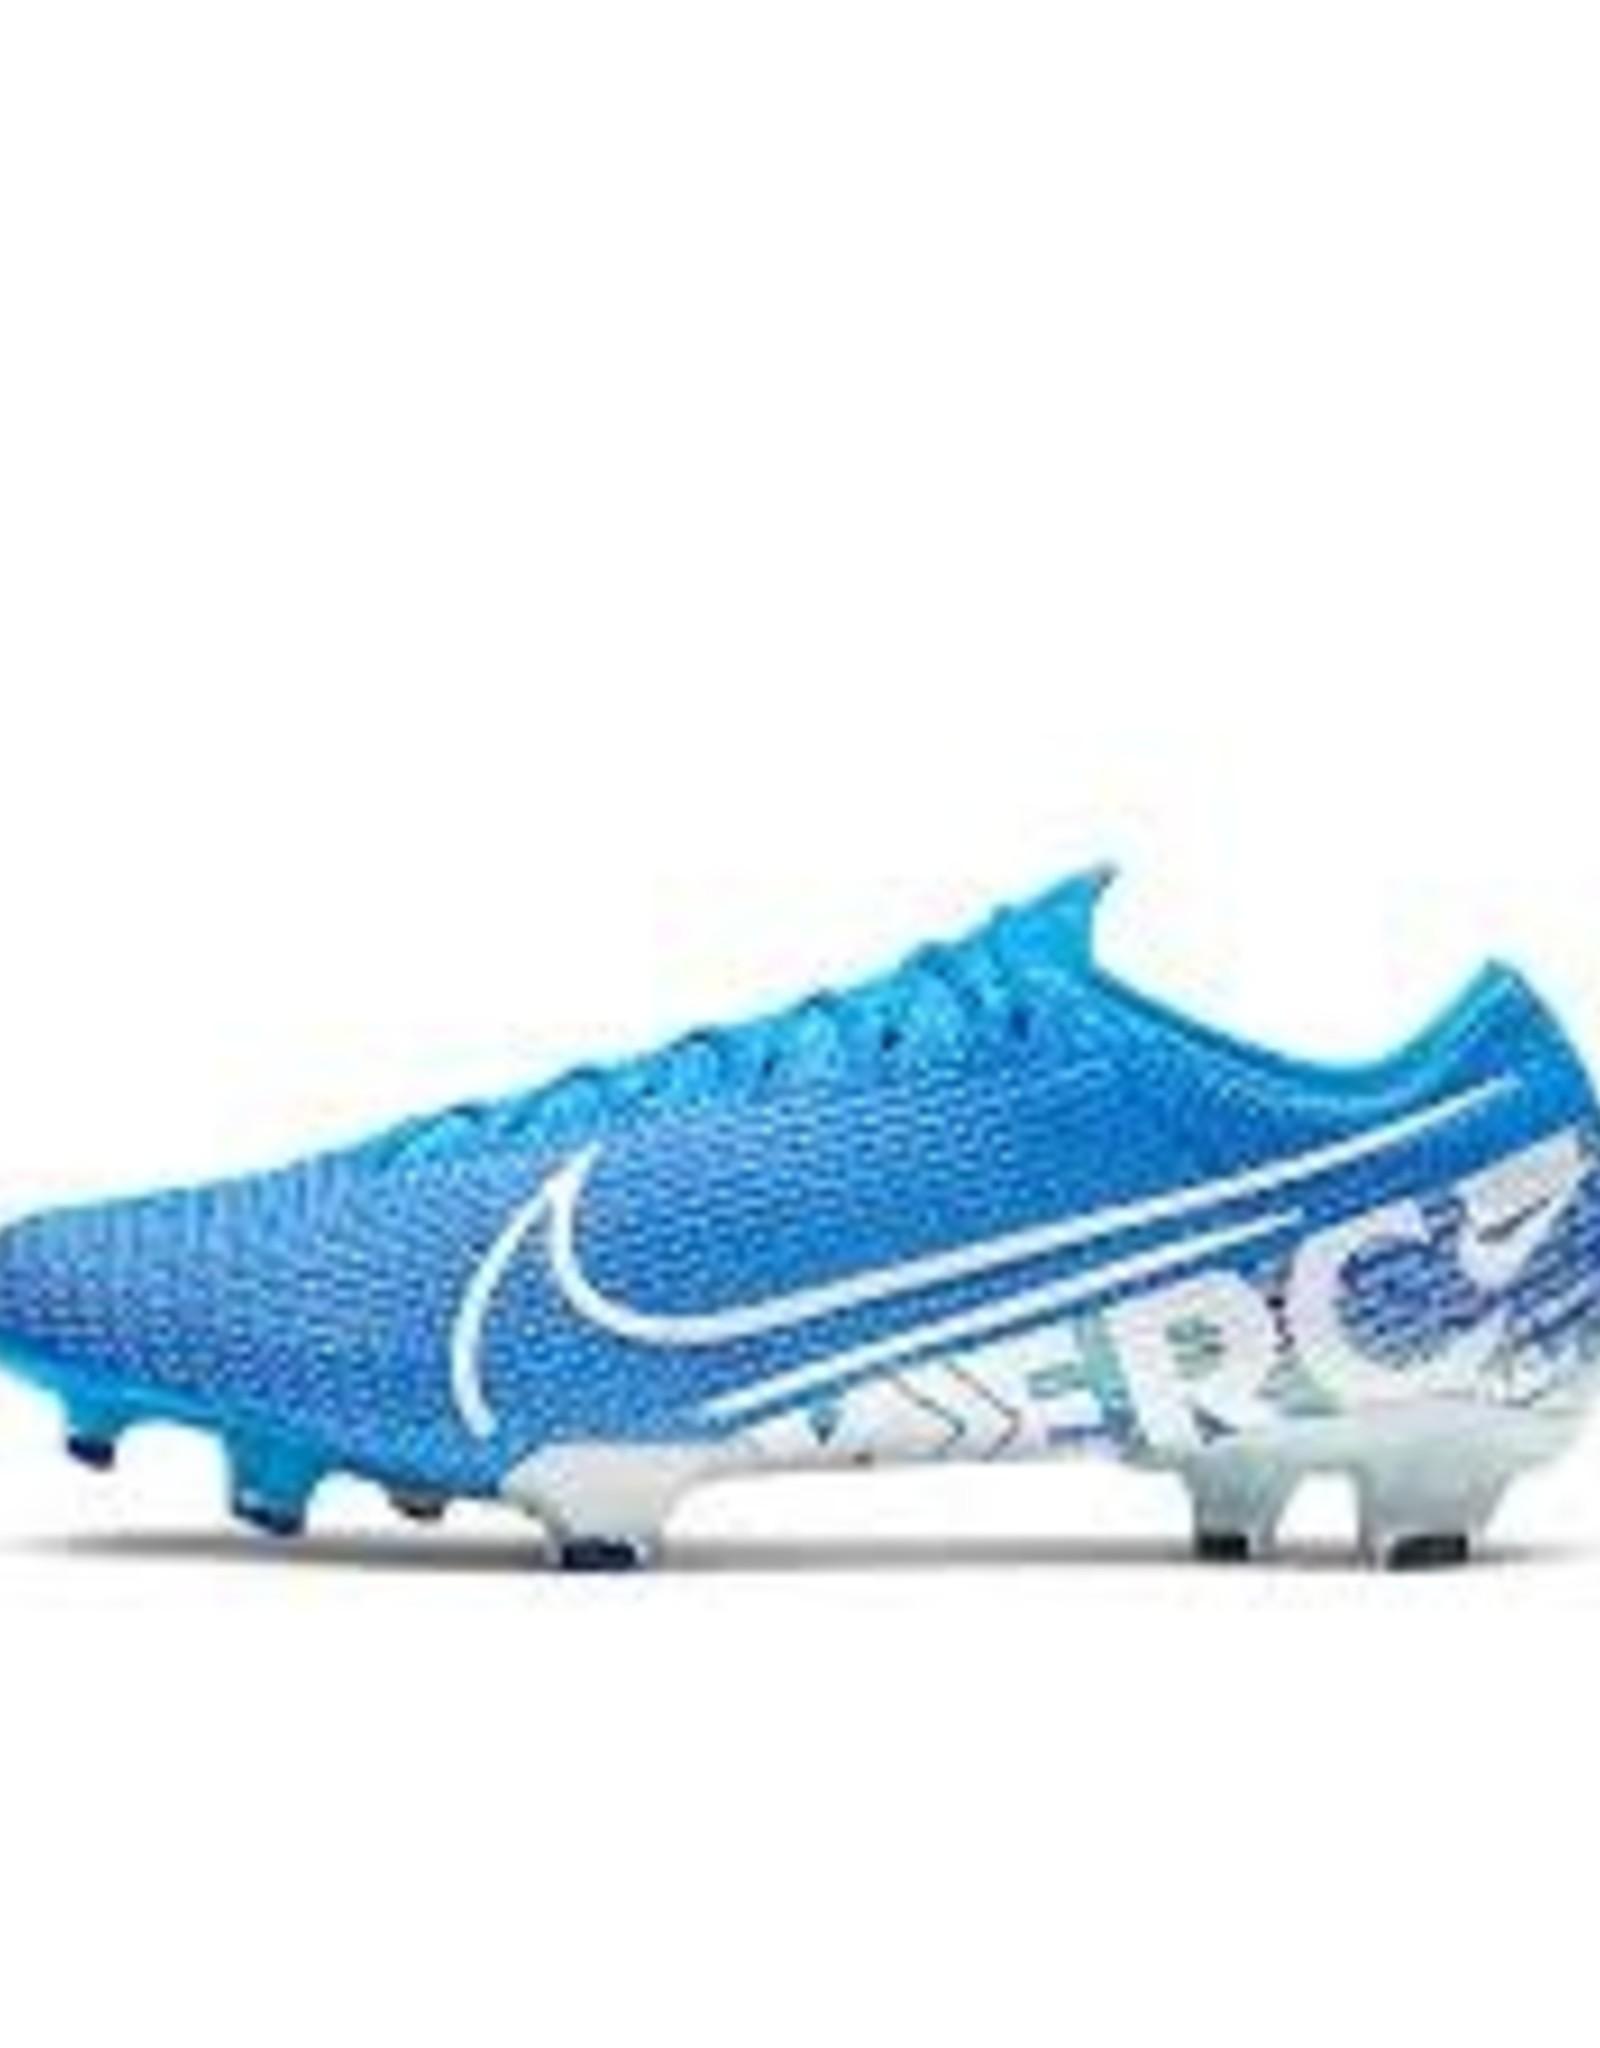 Nike Nike FG Vapor 13 Elite